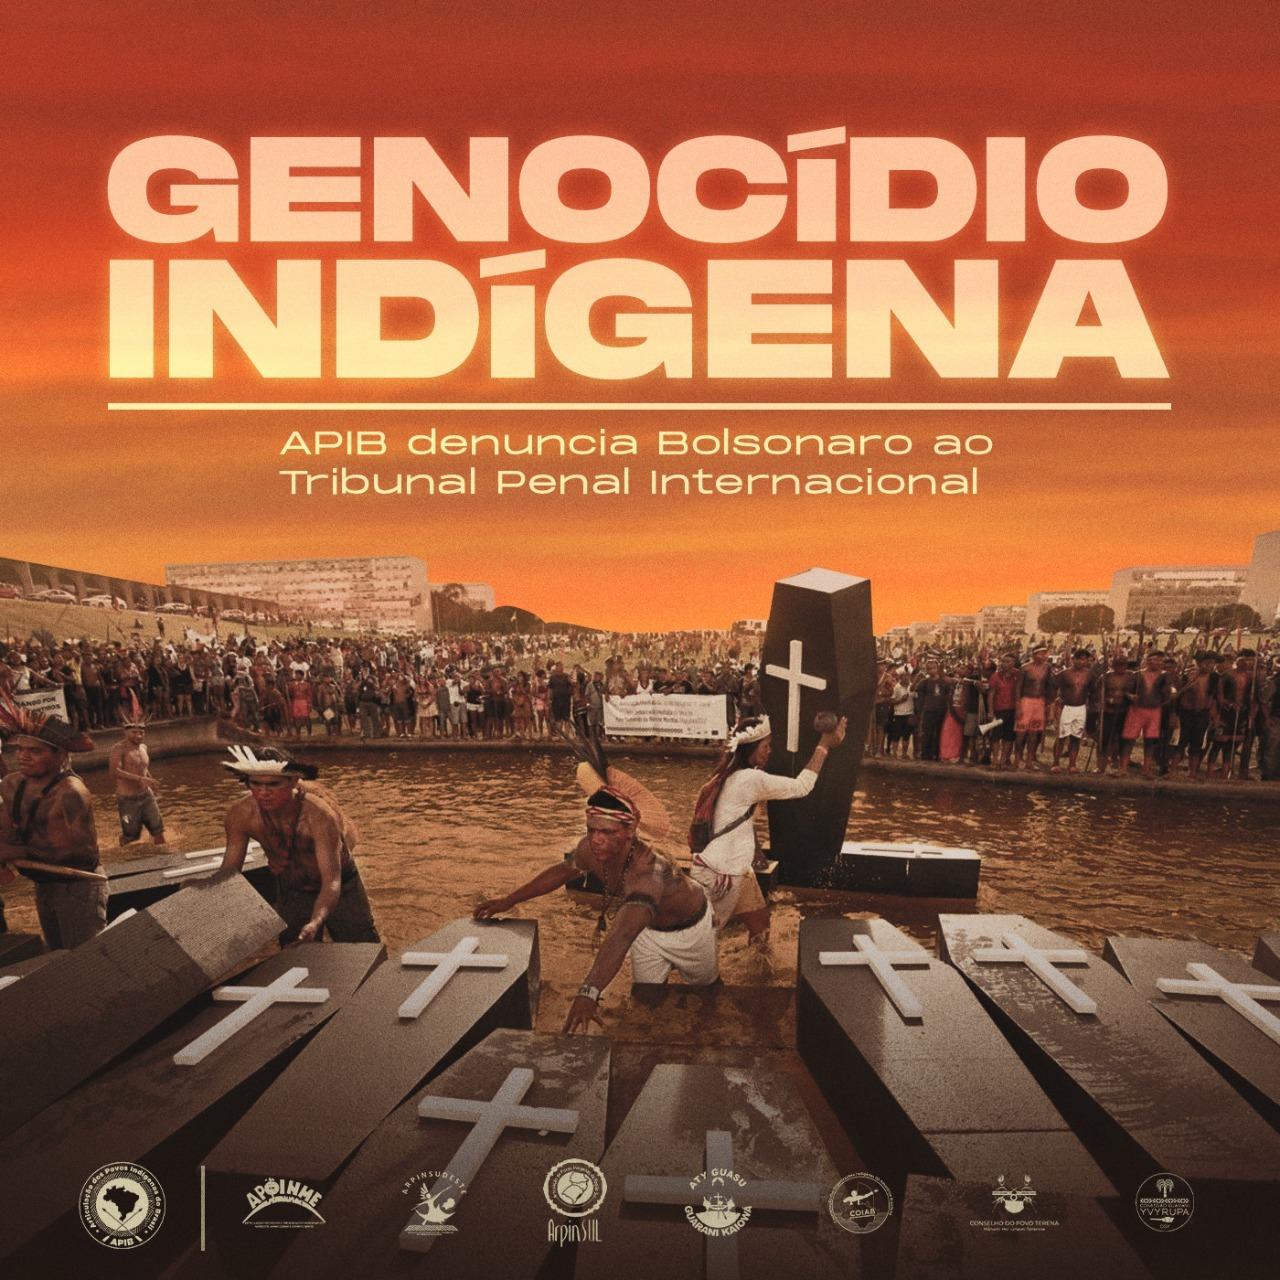 CPT – INÉDITO: APIB denuncia Bolsonaro, em Haia, por genocídio indígena